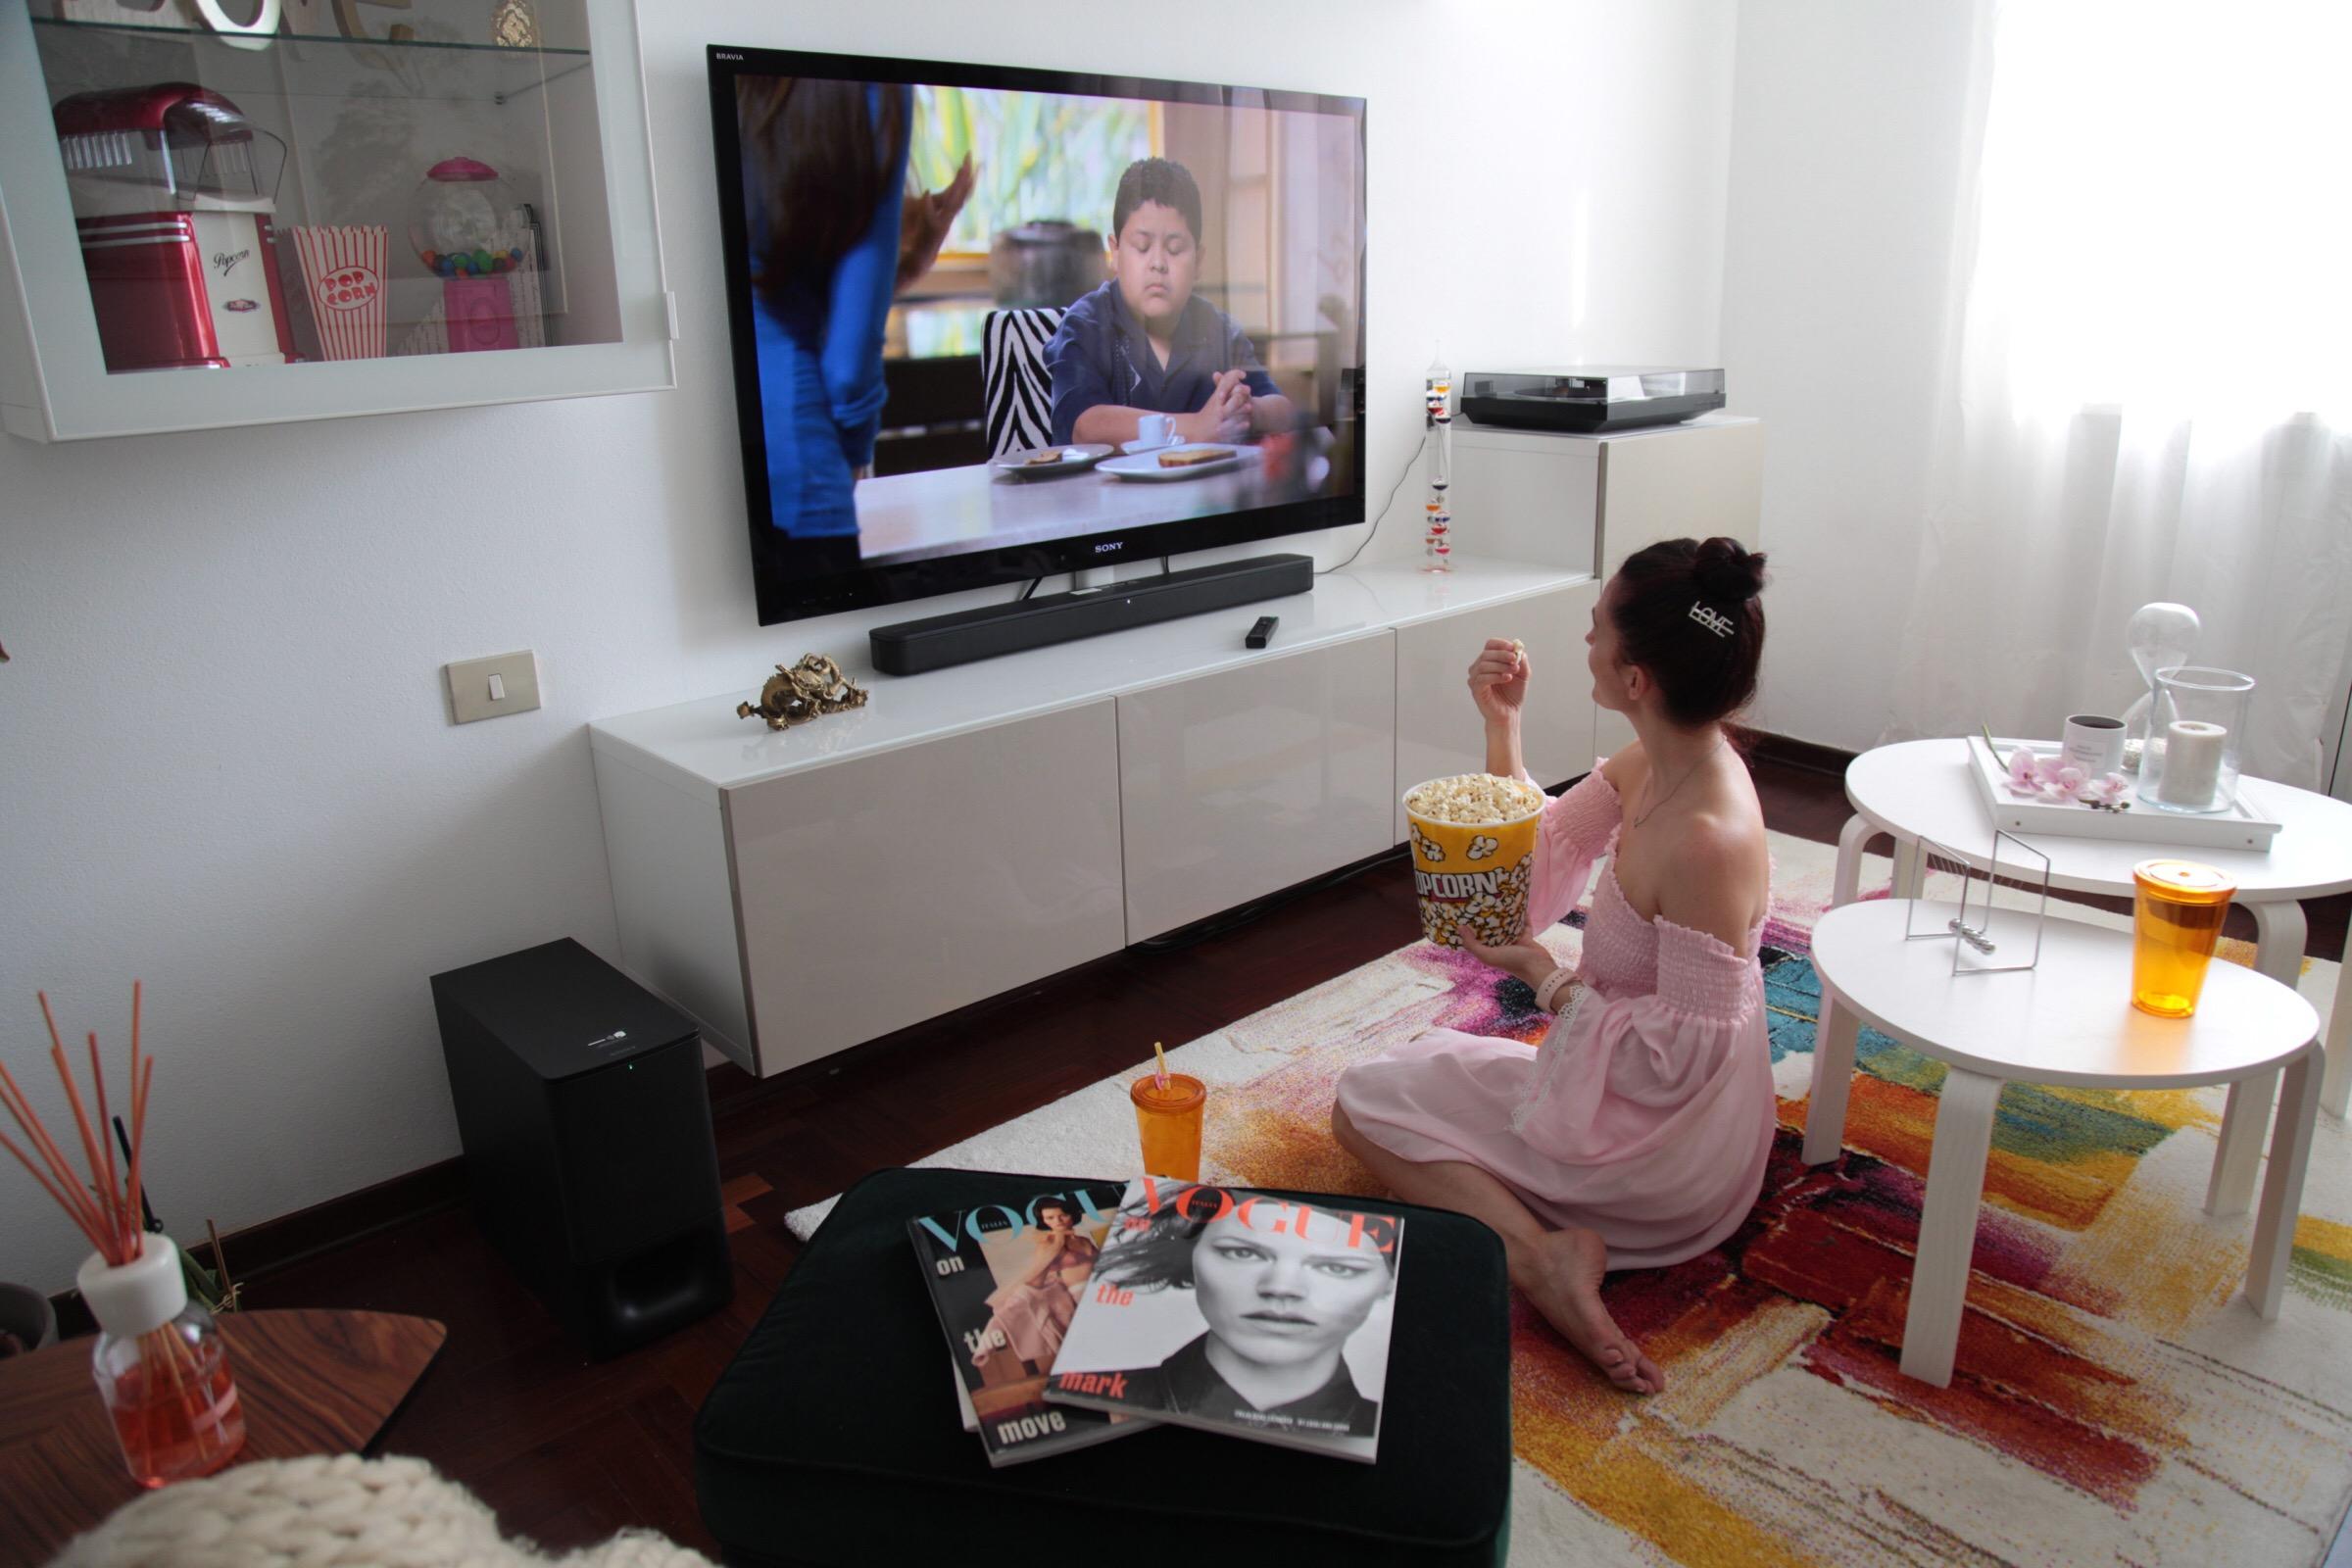 Soundbar HT-S350 di Sony: l'esperienza del cinema a casa.